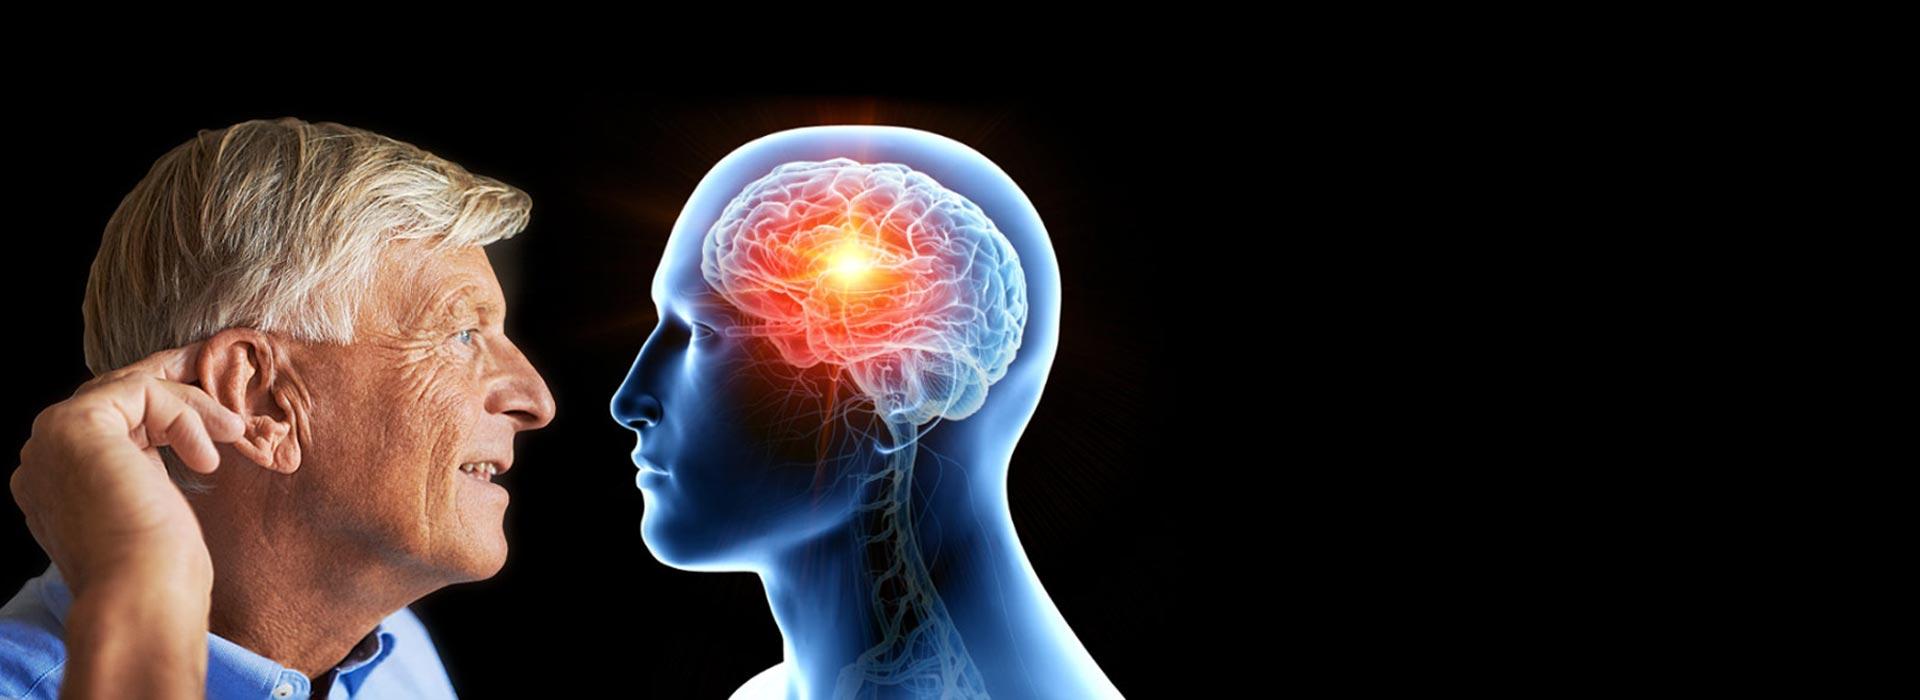 verband-gehoorverlies-dementie-introbanner